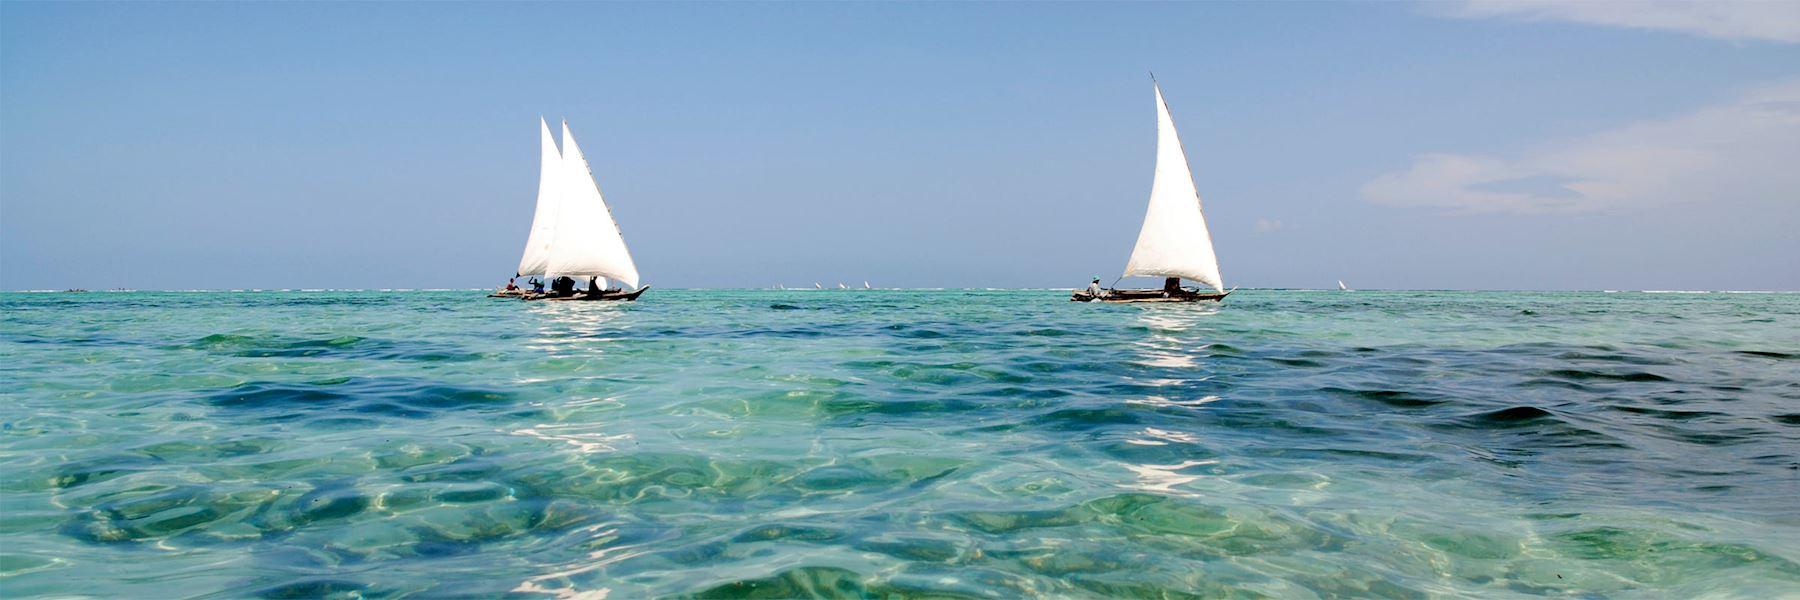 Things to do in Zanzibar Archipelago